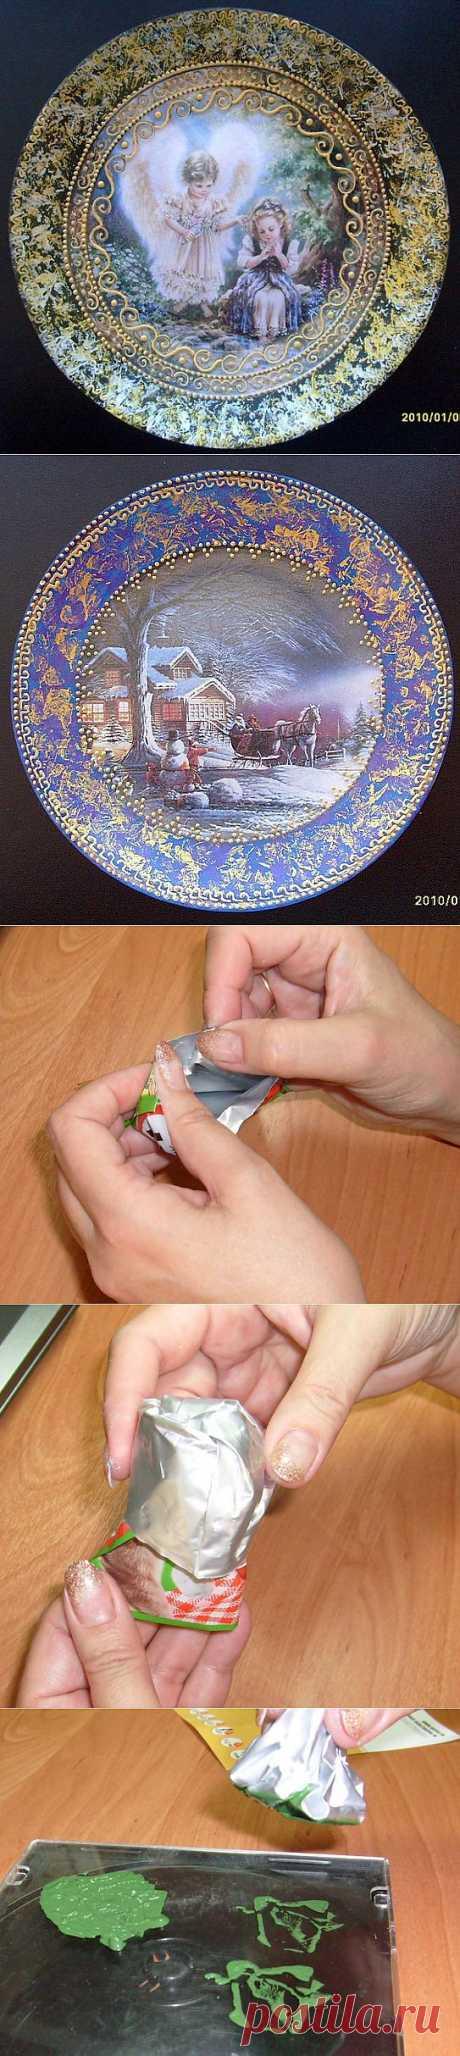 Декупаж тарелок. Как сделать фон пакетом. .